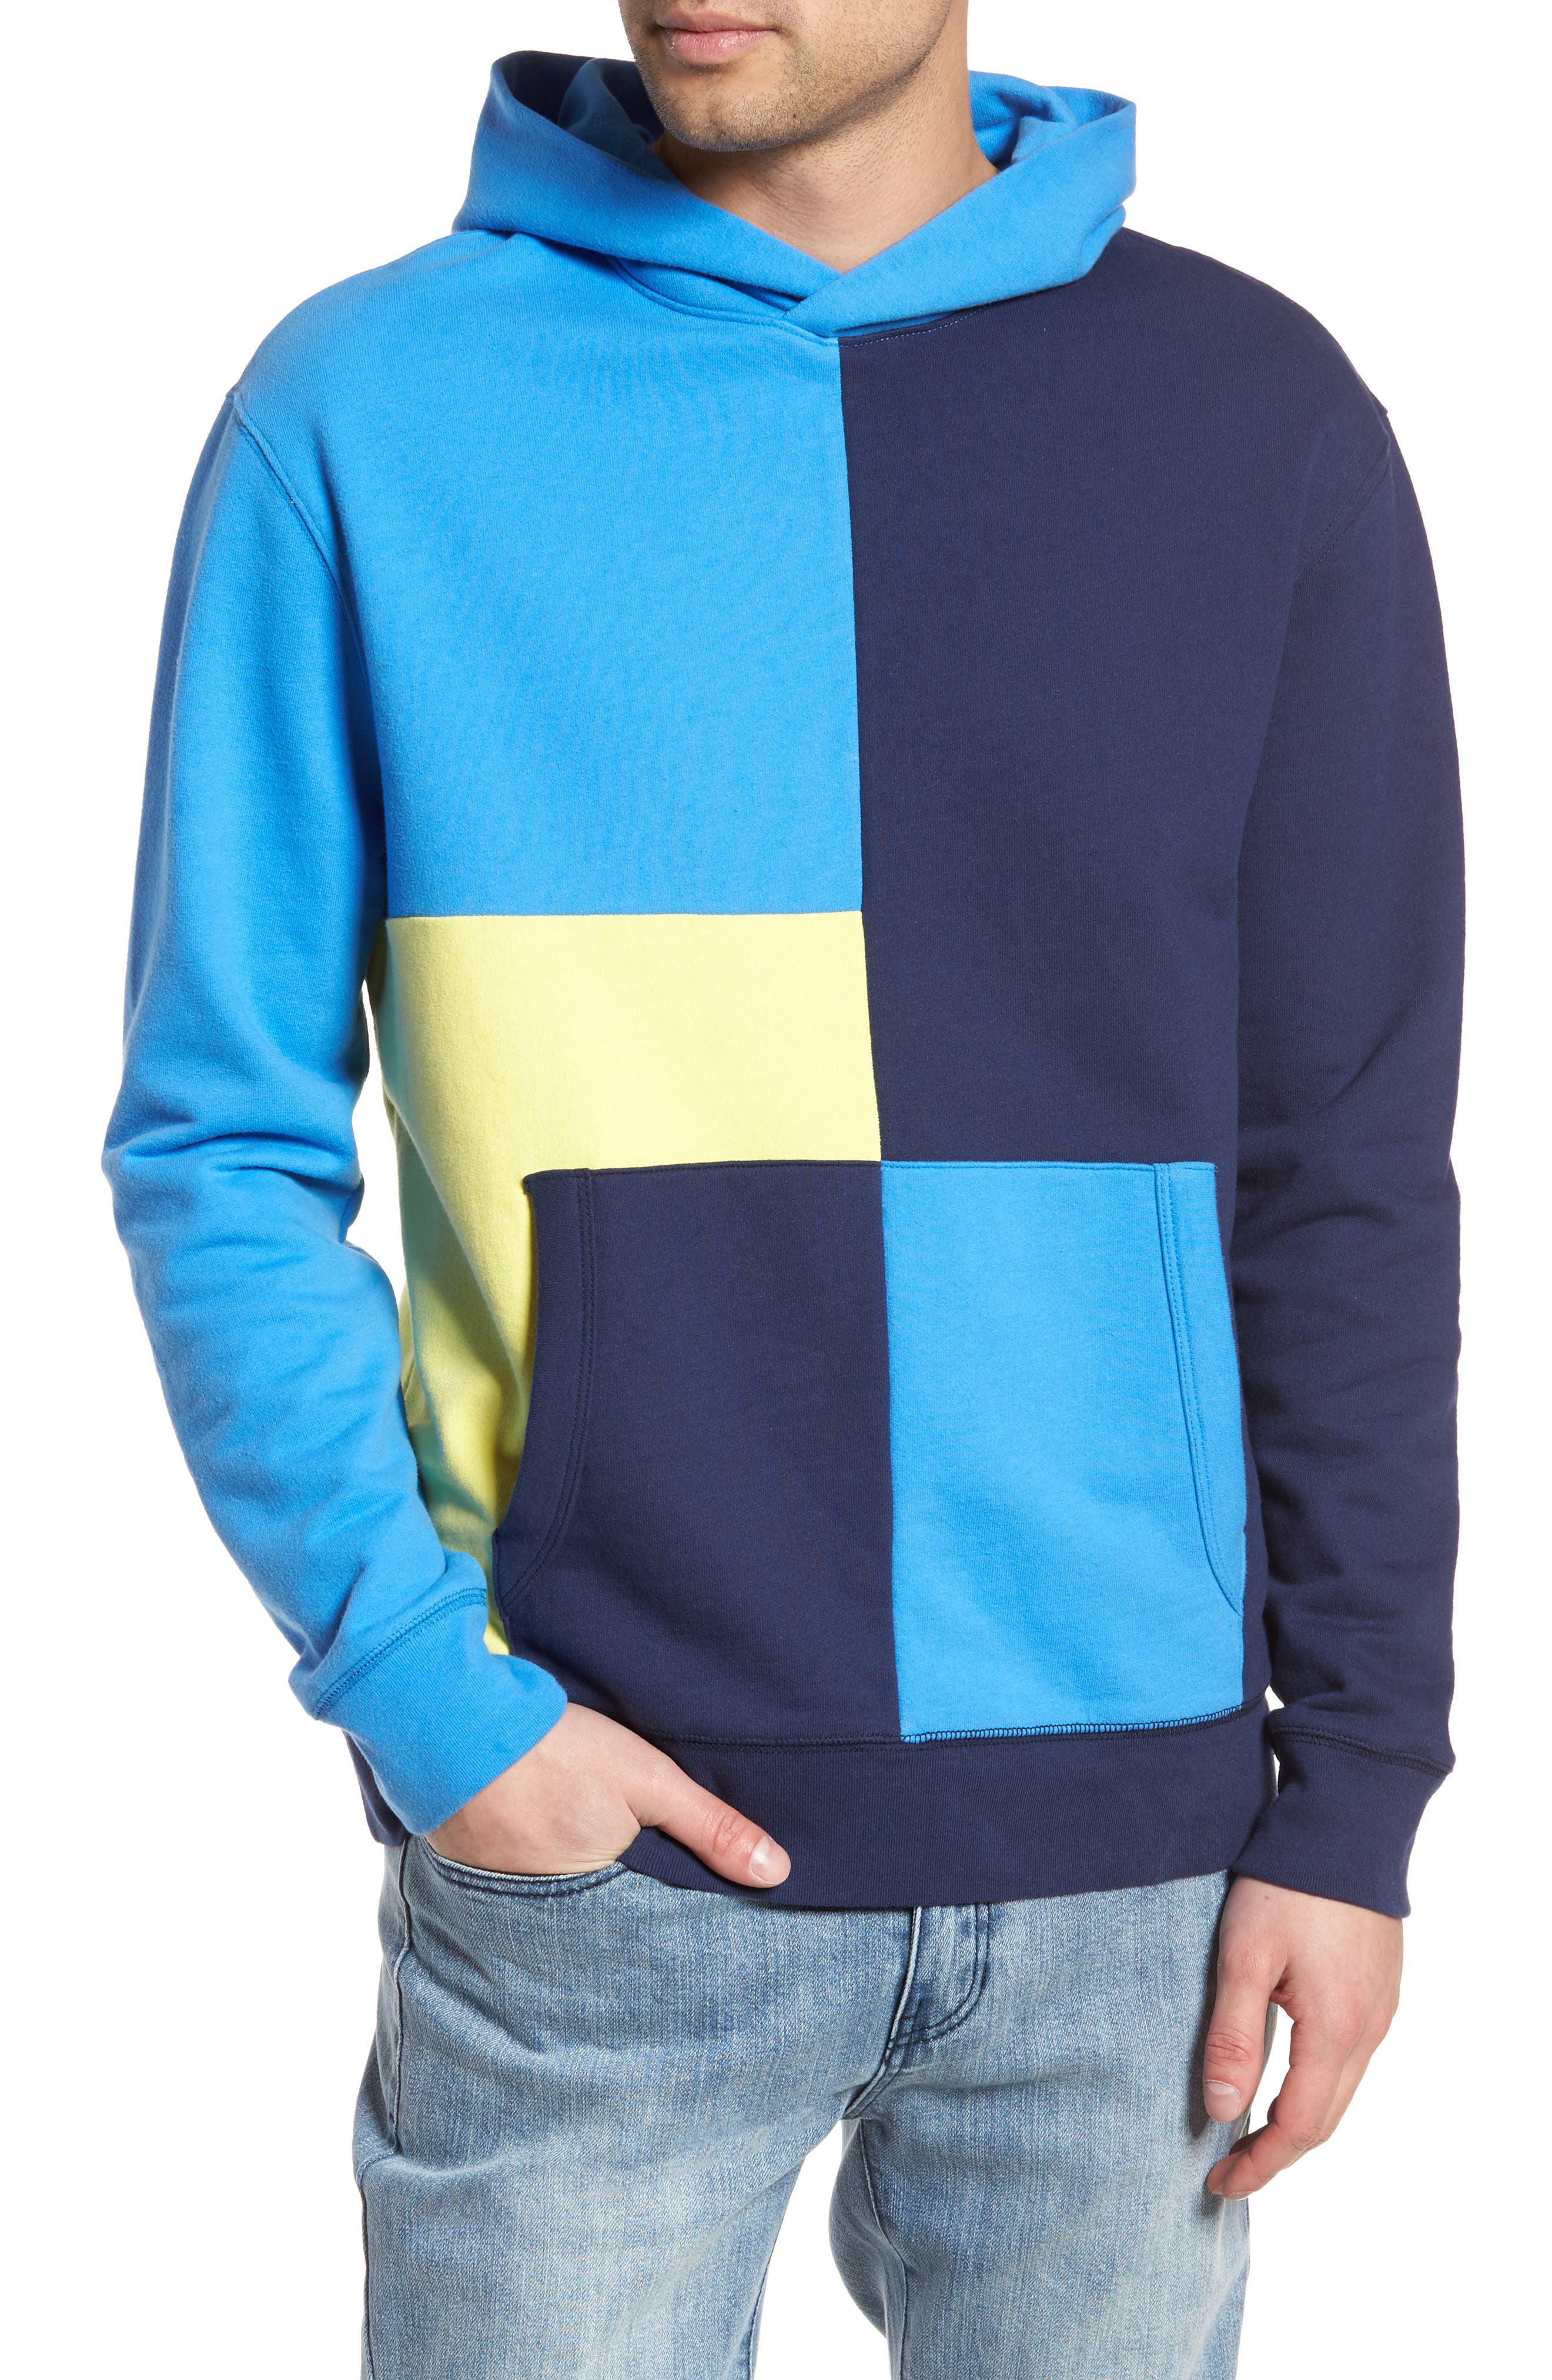 Colorblock Hoodie Sweatshirt,                         Main,                         color, Navy Blue Yellow Block